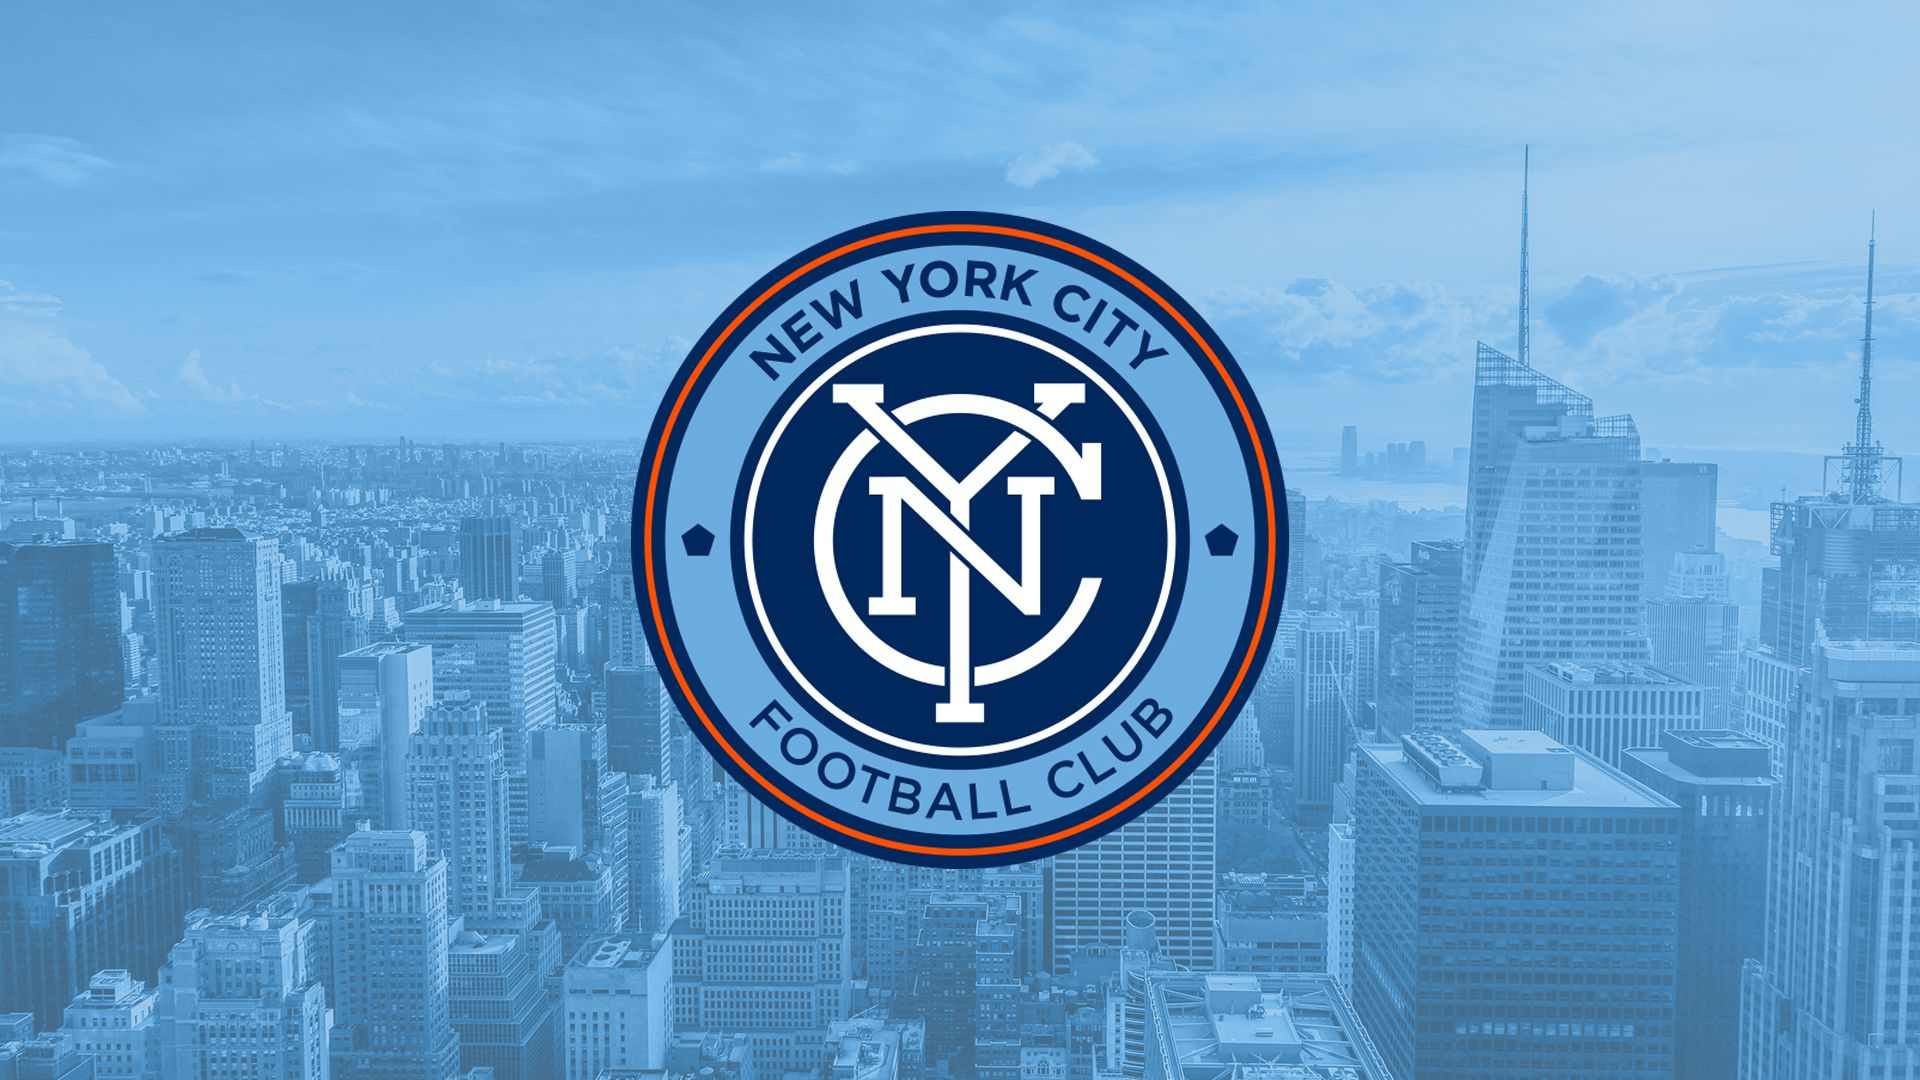 Pin On Football Club National Team Logos